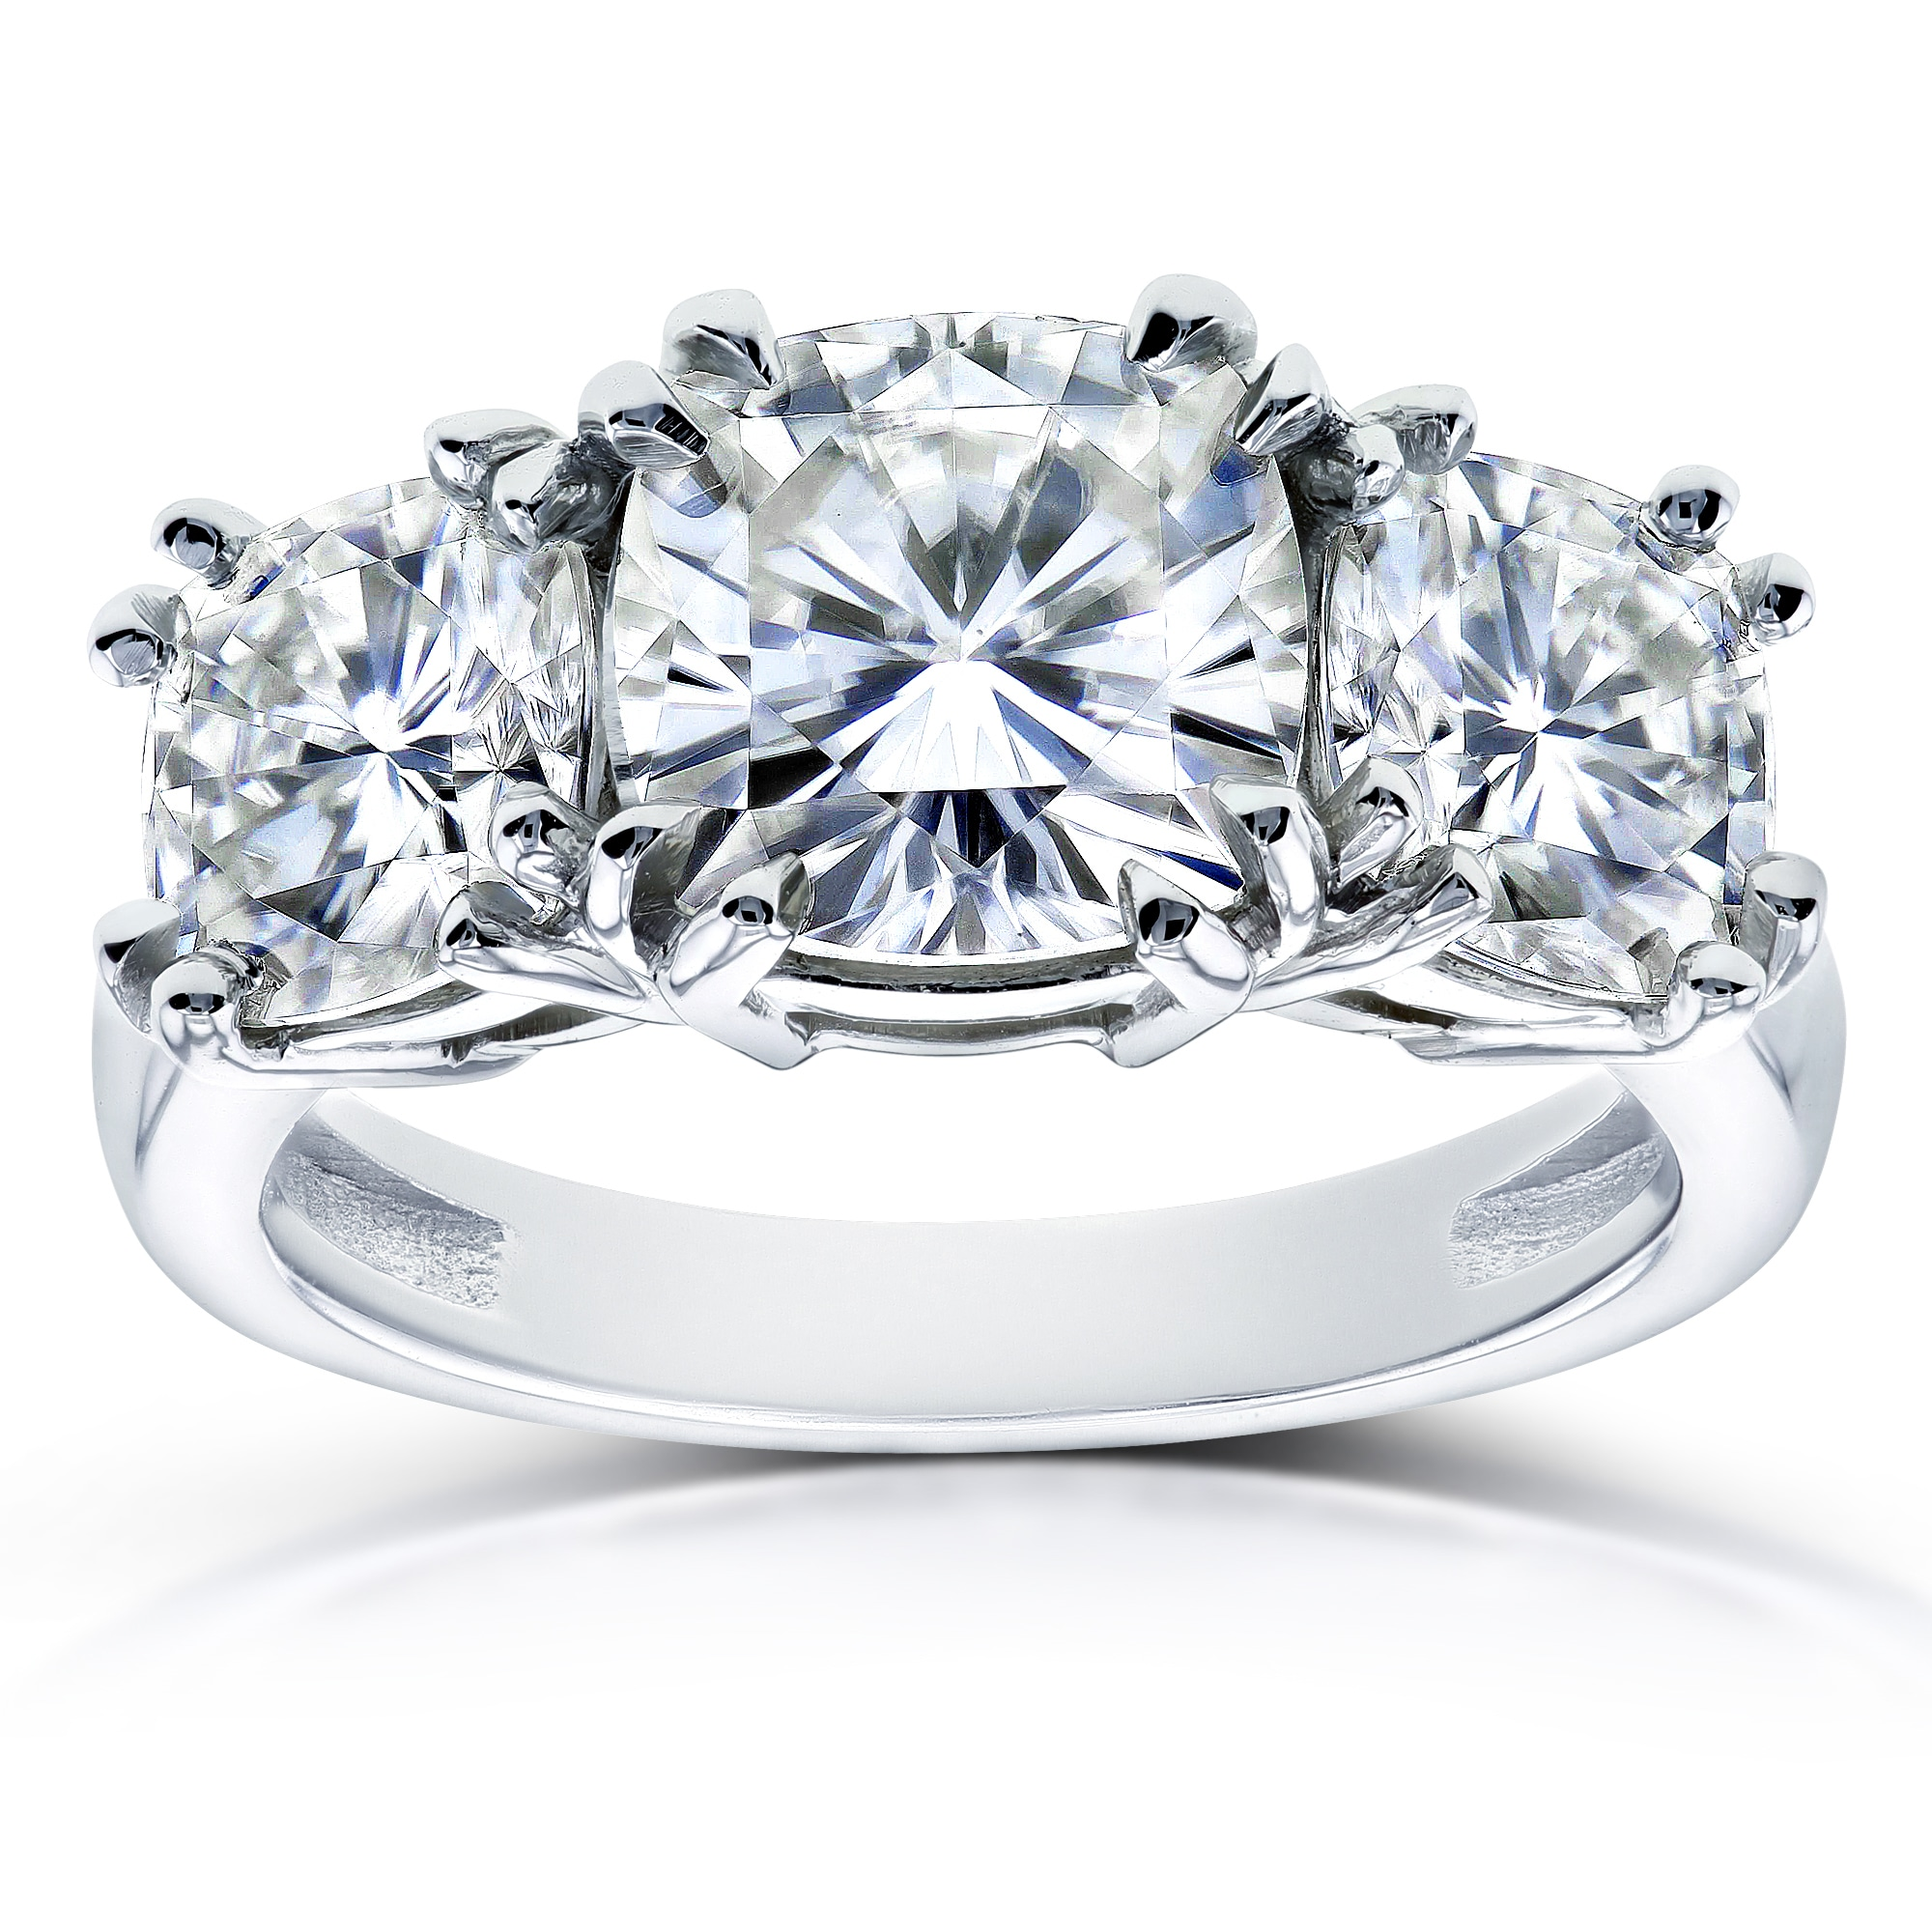 Annello By Kobelli 14k White Gold 4 1 5ct Tgw Moissanite Fg Cushion Cut 3 Stone Engagement Ring